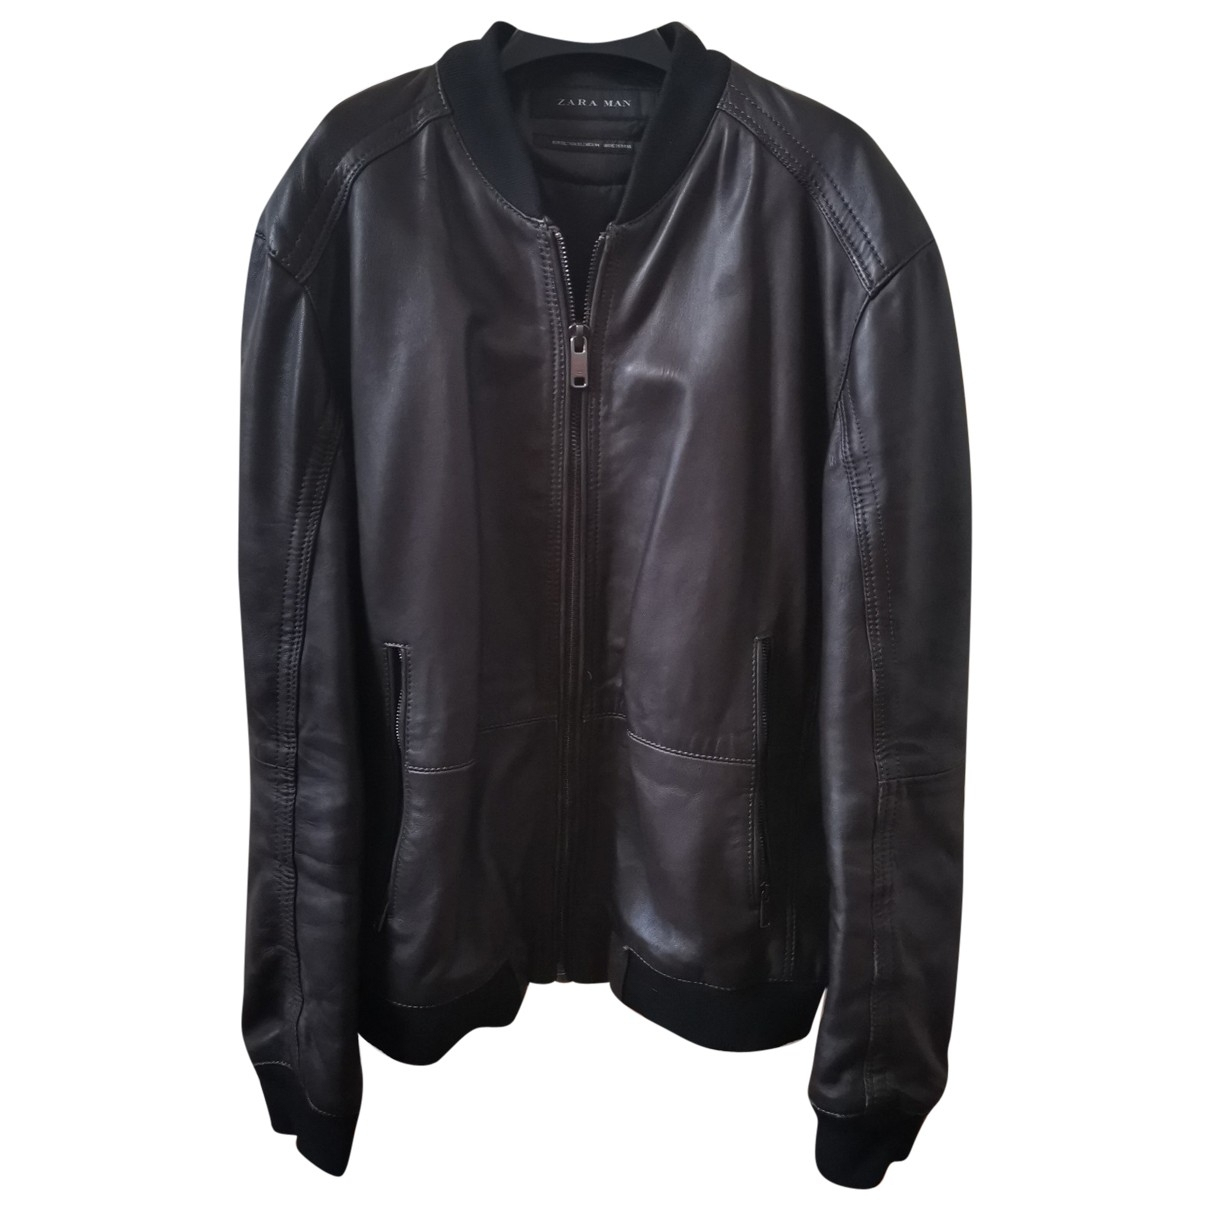 Zara \N Brown Leather jacket  for Men XL International